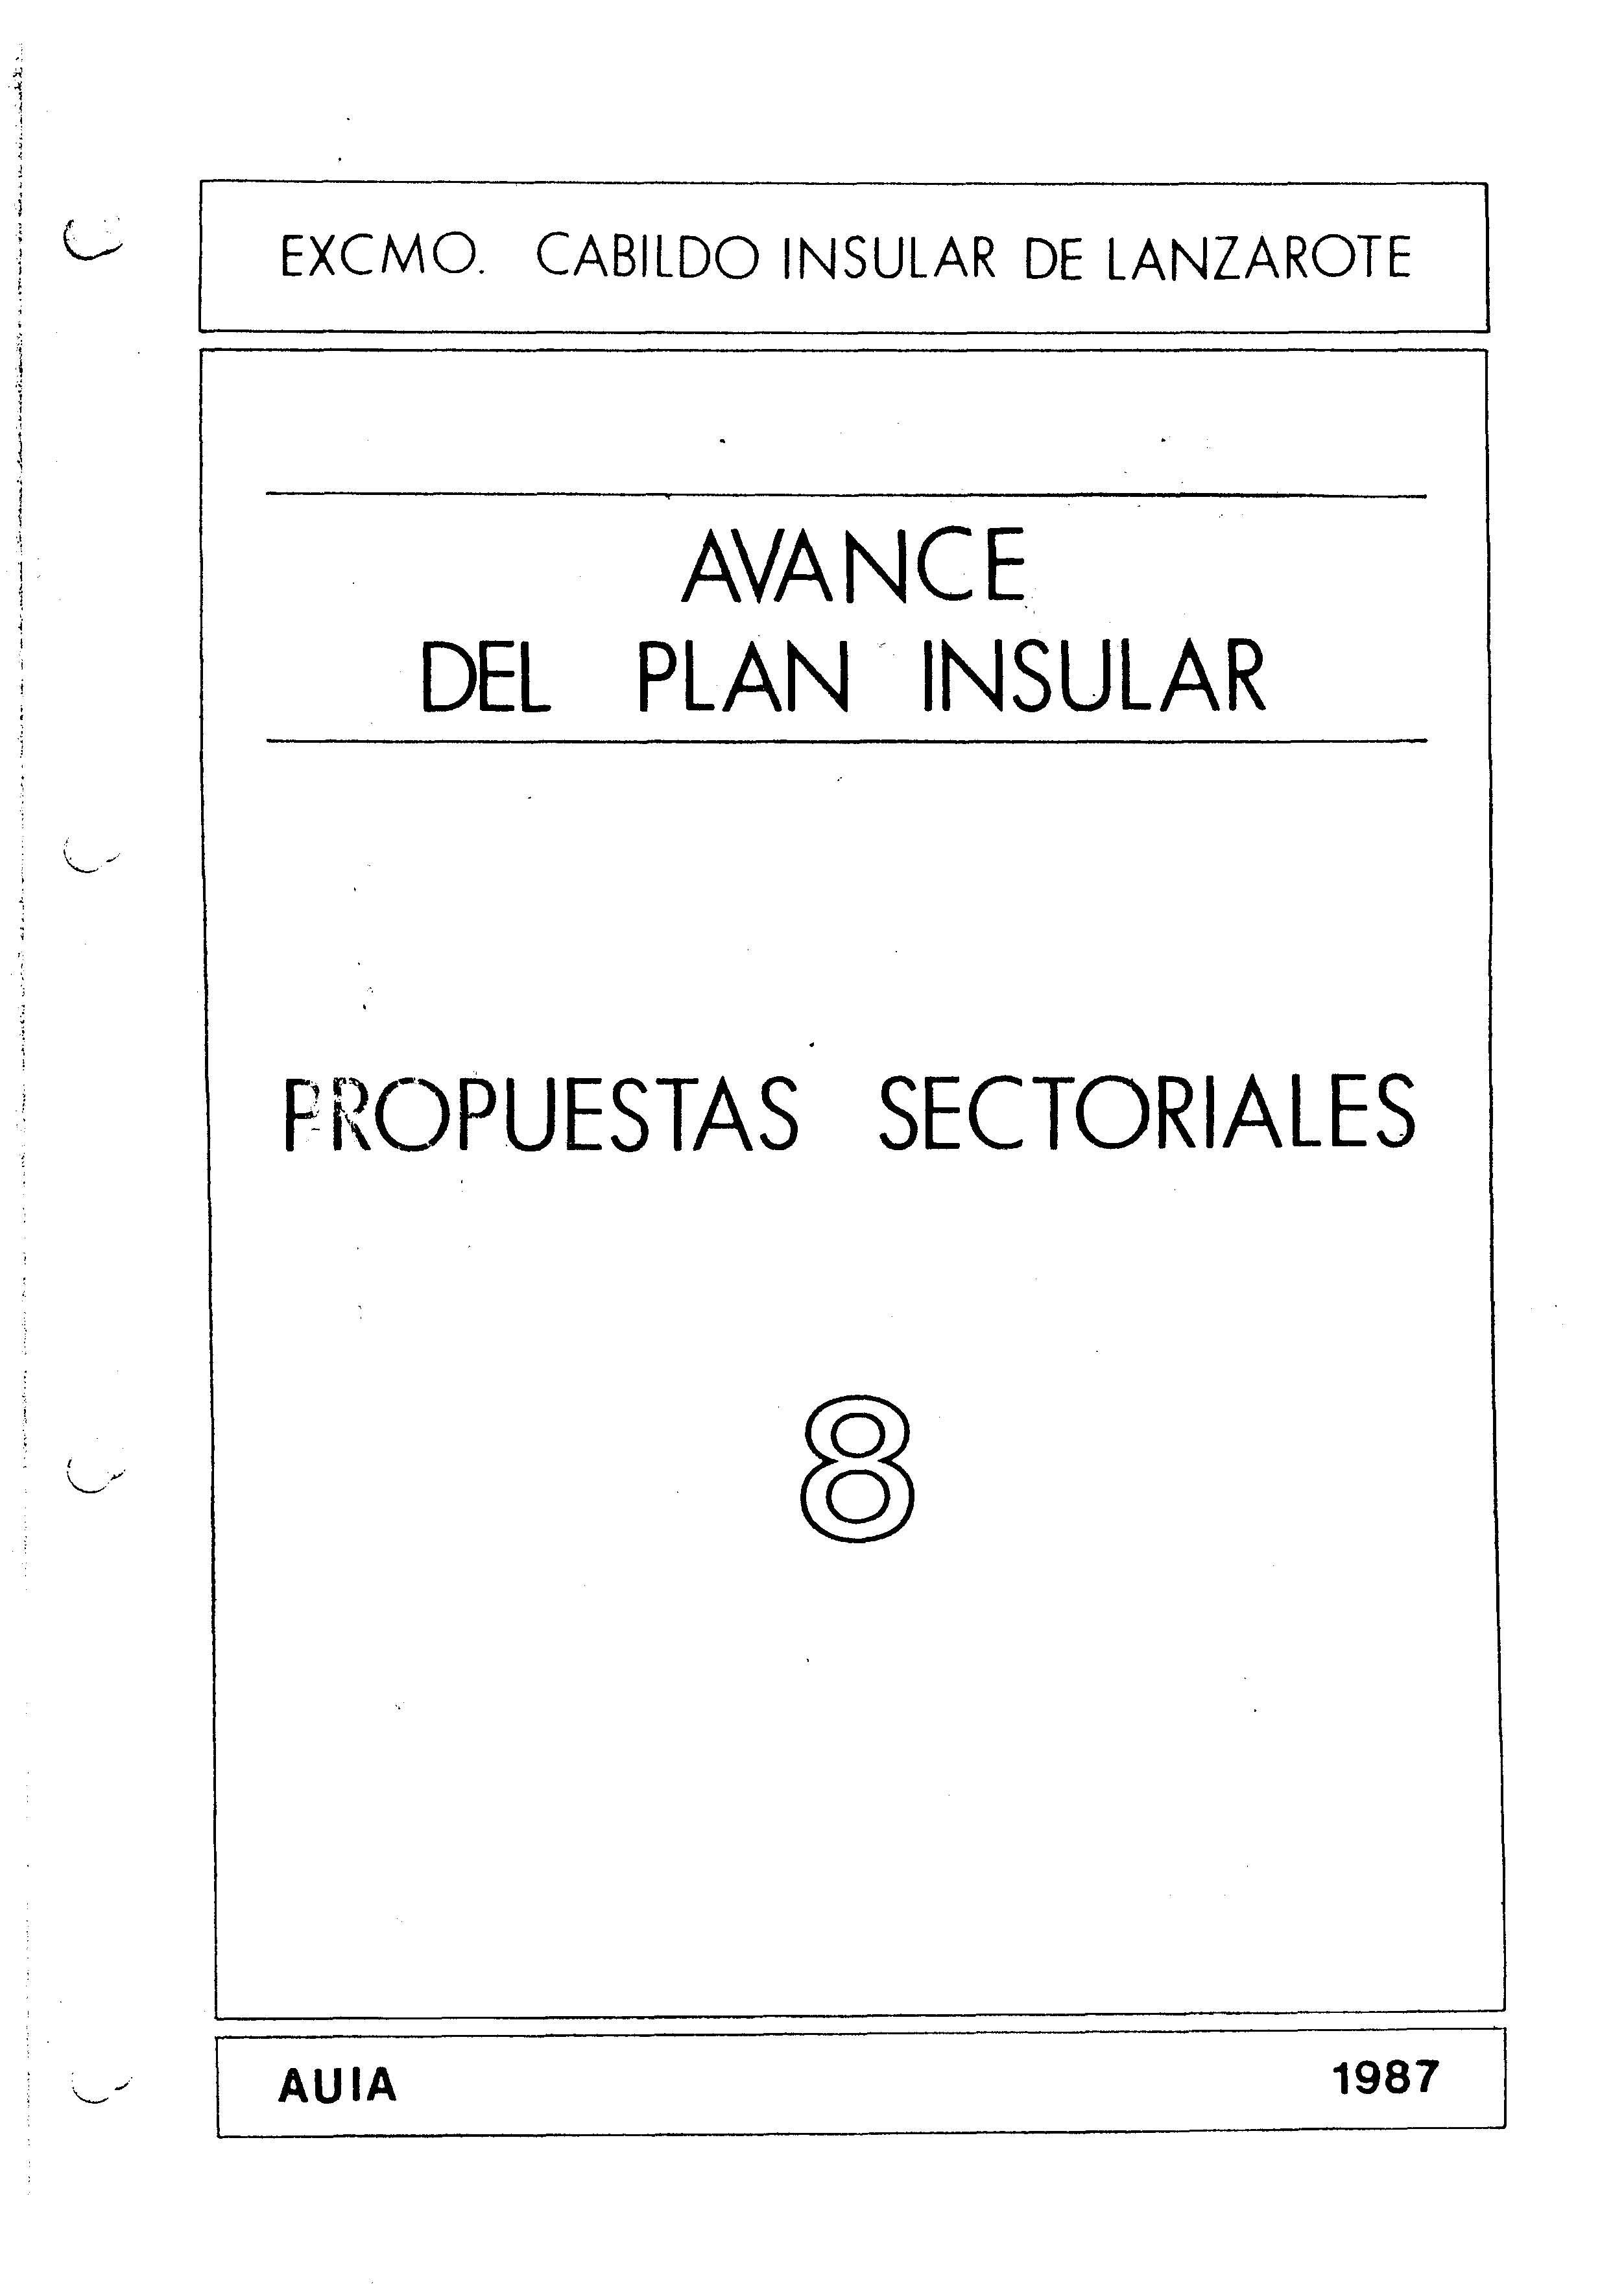 Tomo 8. Área Jurídica. Avance Plan Insular (1987)